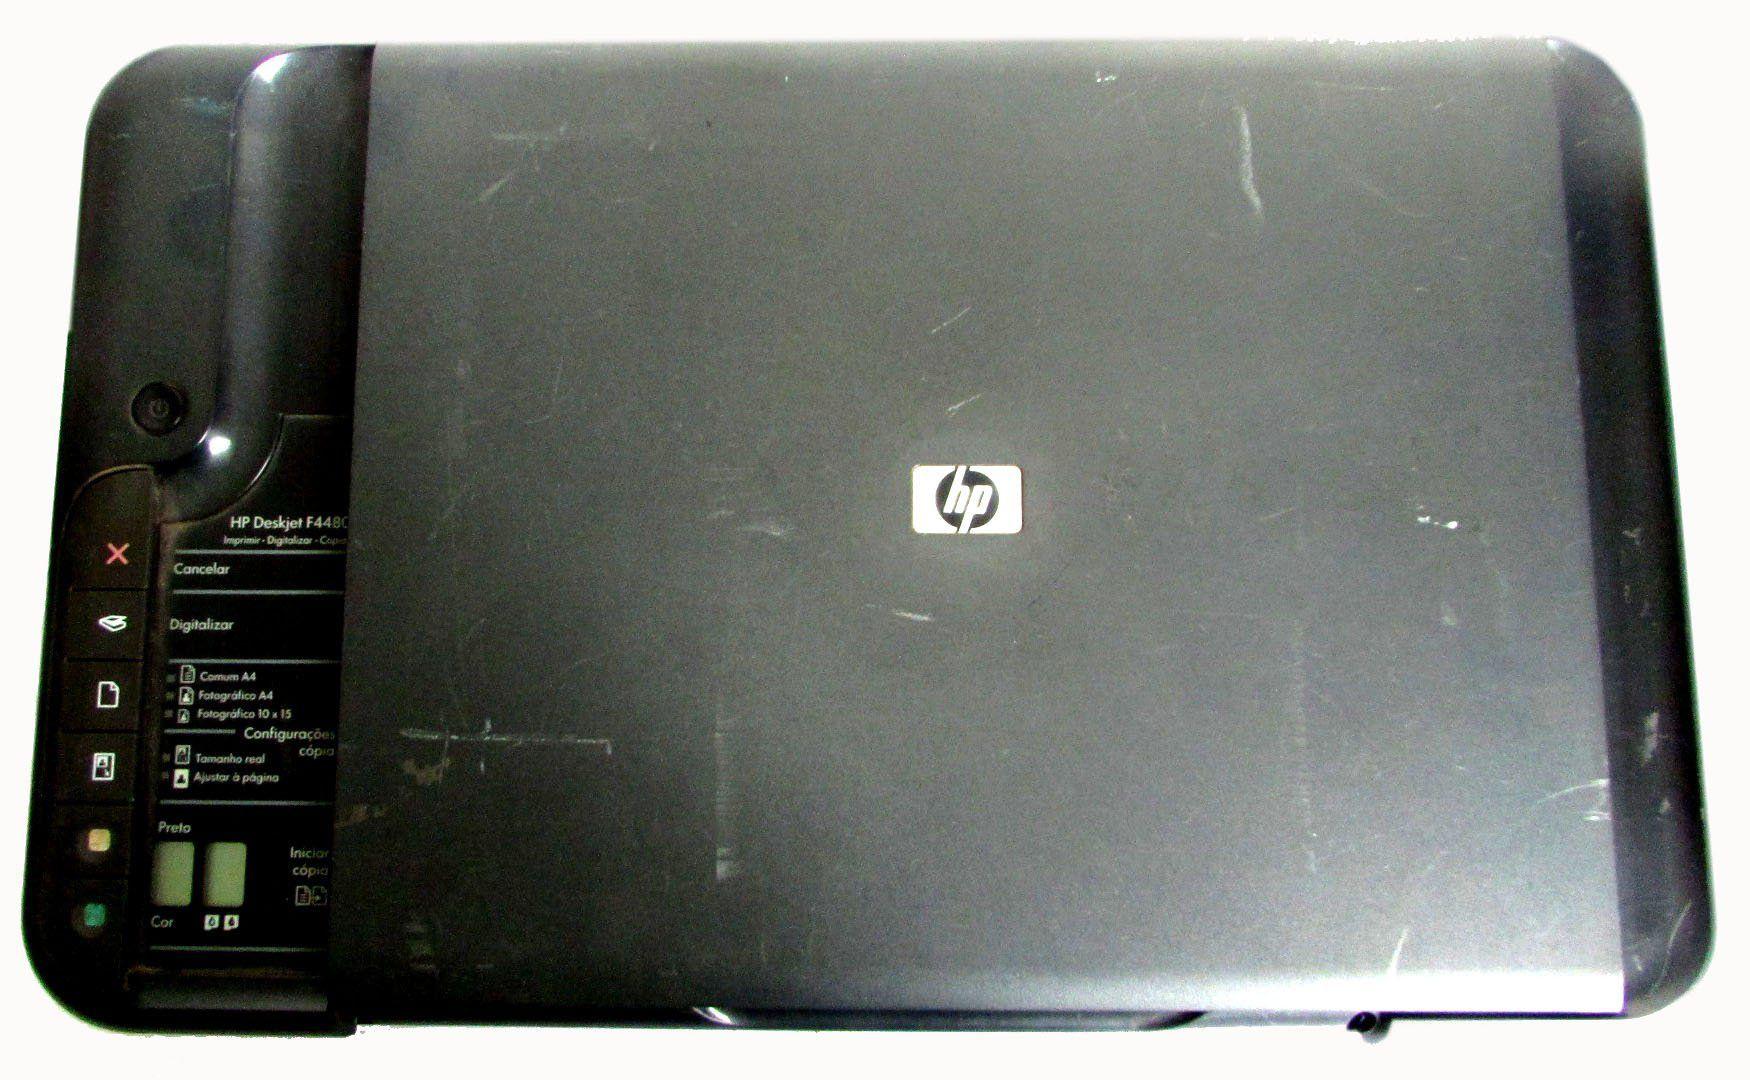 Scanner Para Multifuncional Hp F4480 Completo (semi novo)